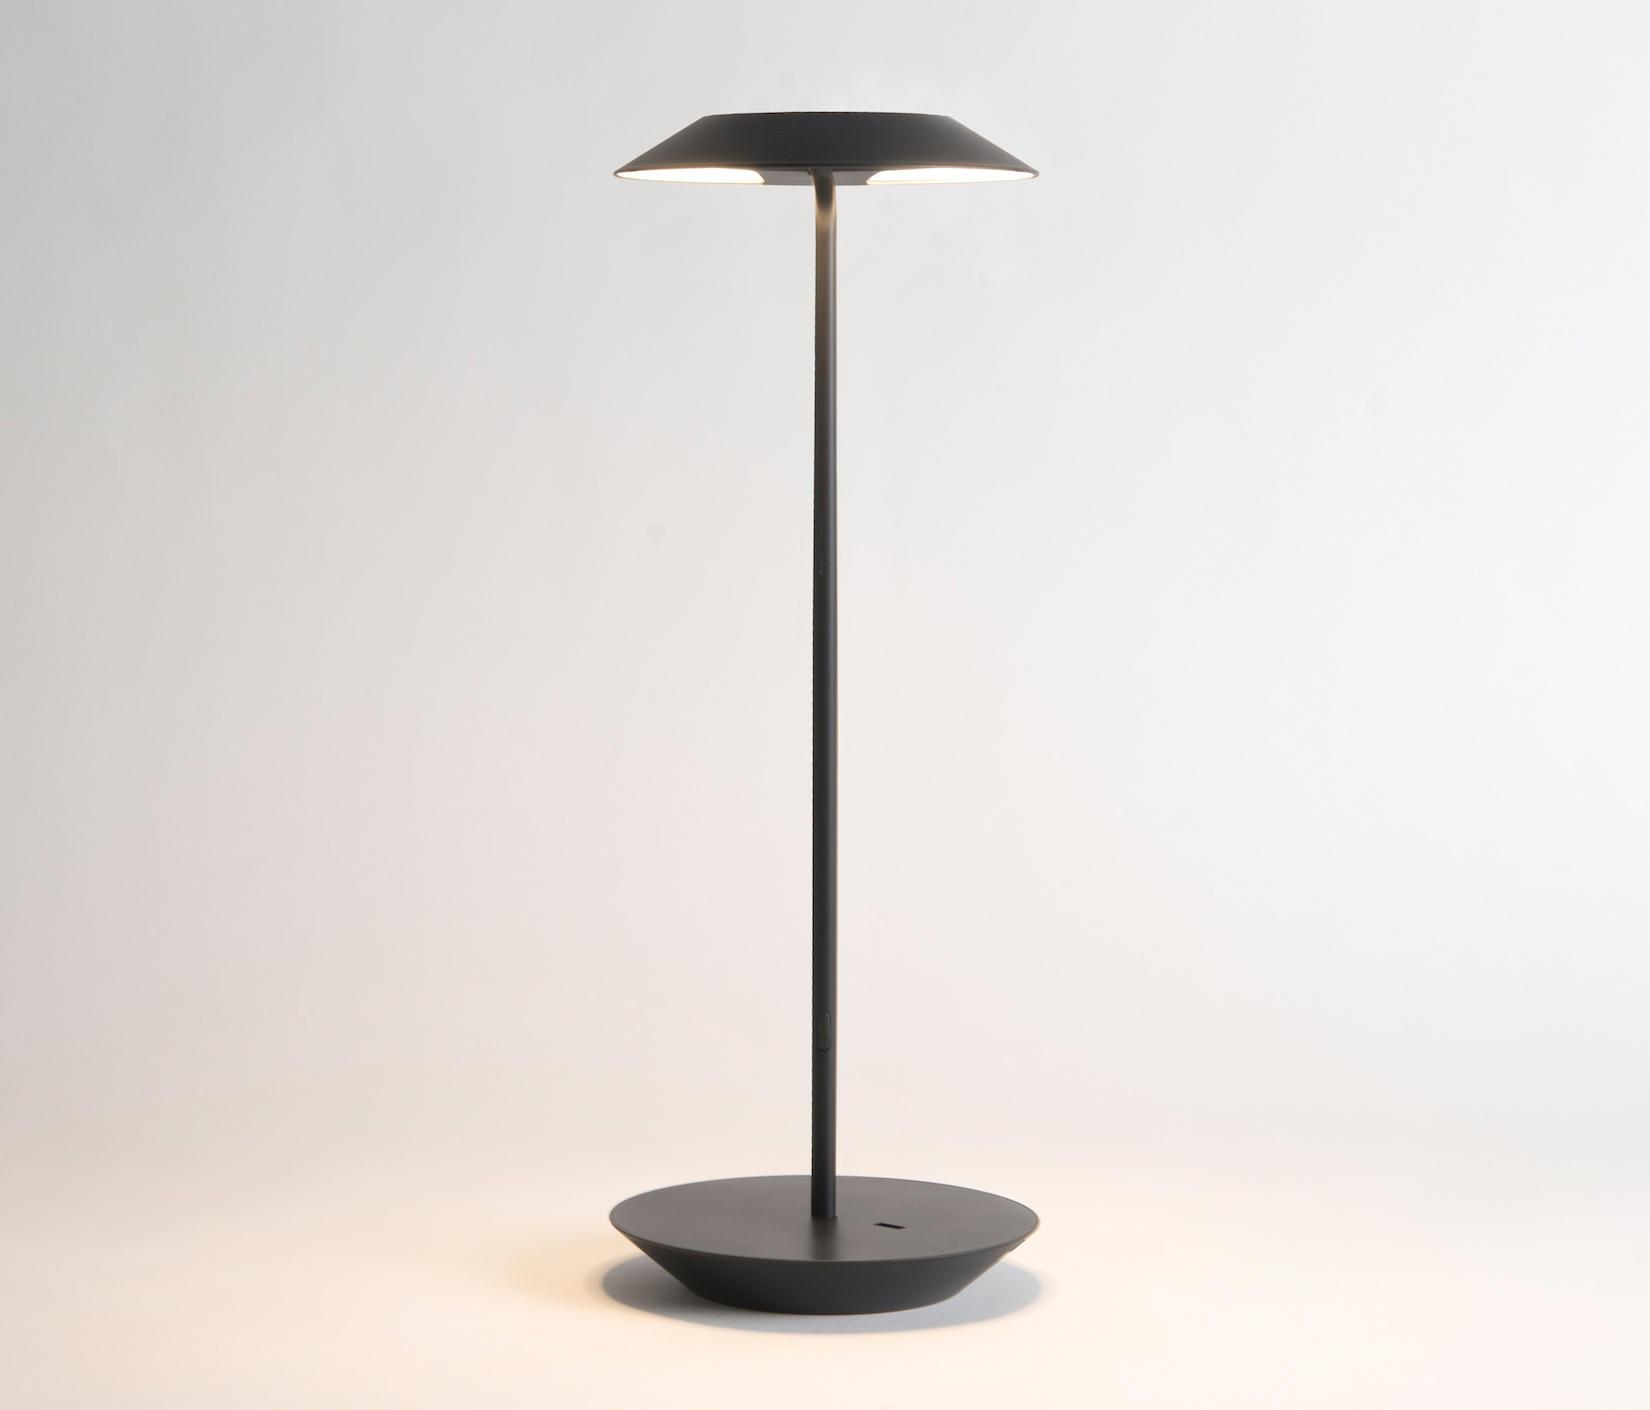 Royyo desk lamp matte black body matte black base plate royyo desk lamp matte black body matte black base plate de koncept iluminacin aloadofball Image collections